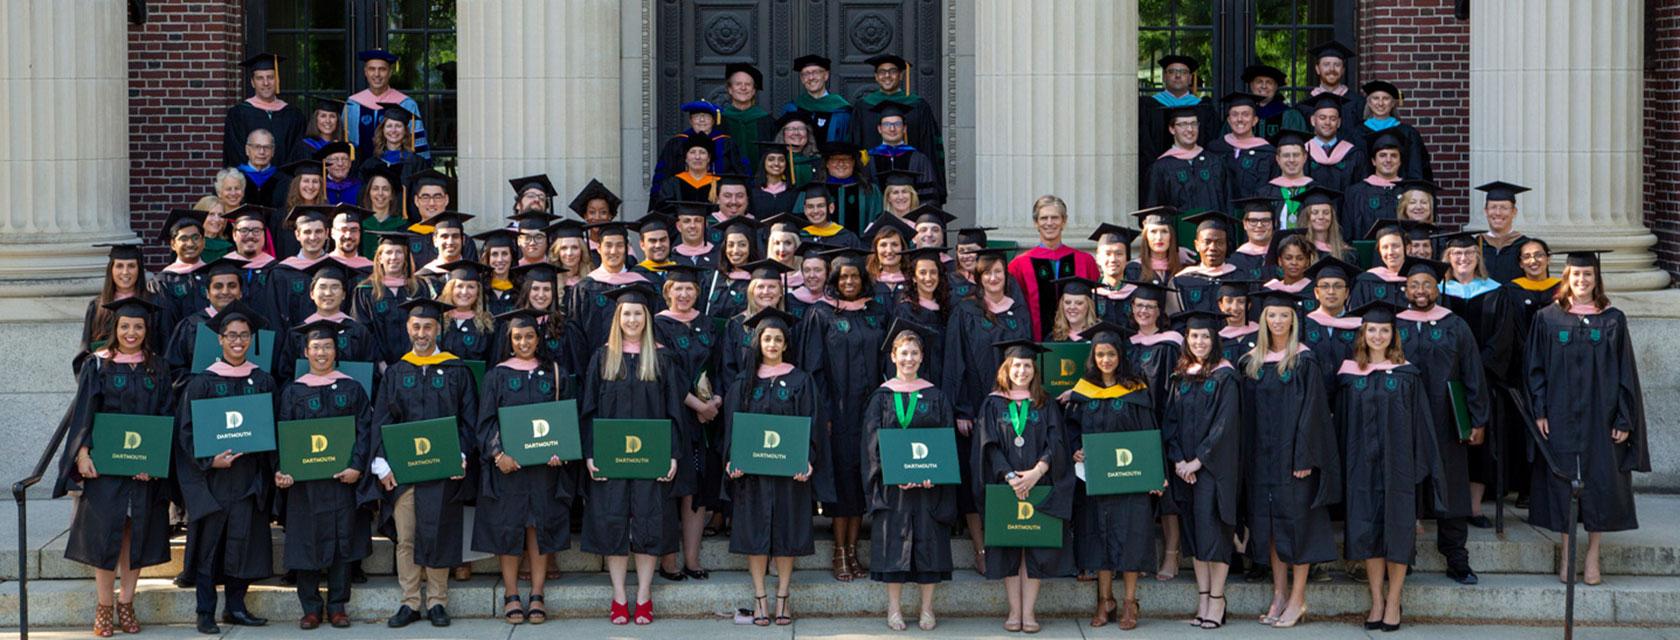 Dartmouth Graduation 2020.Dartmouth Institute Class Day Highlights Geisel News